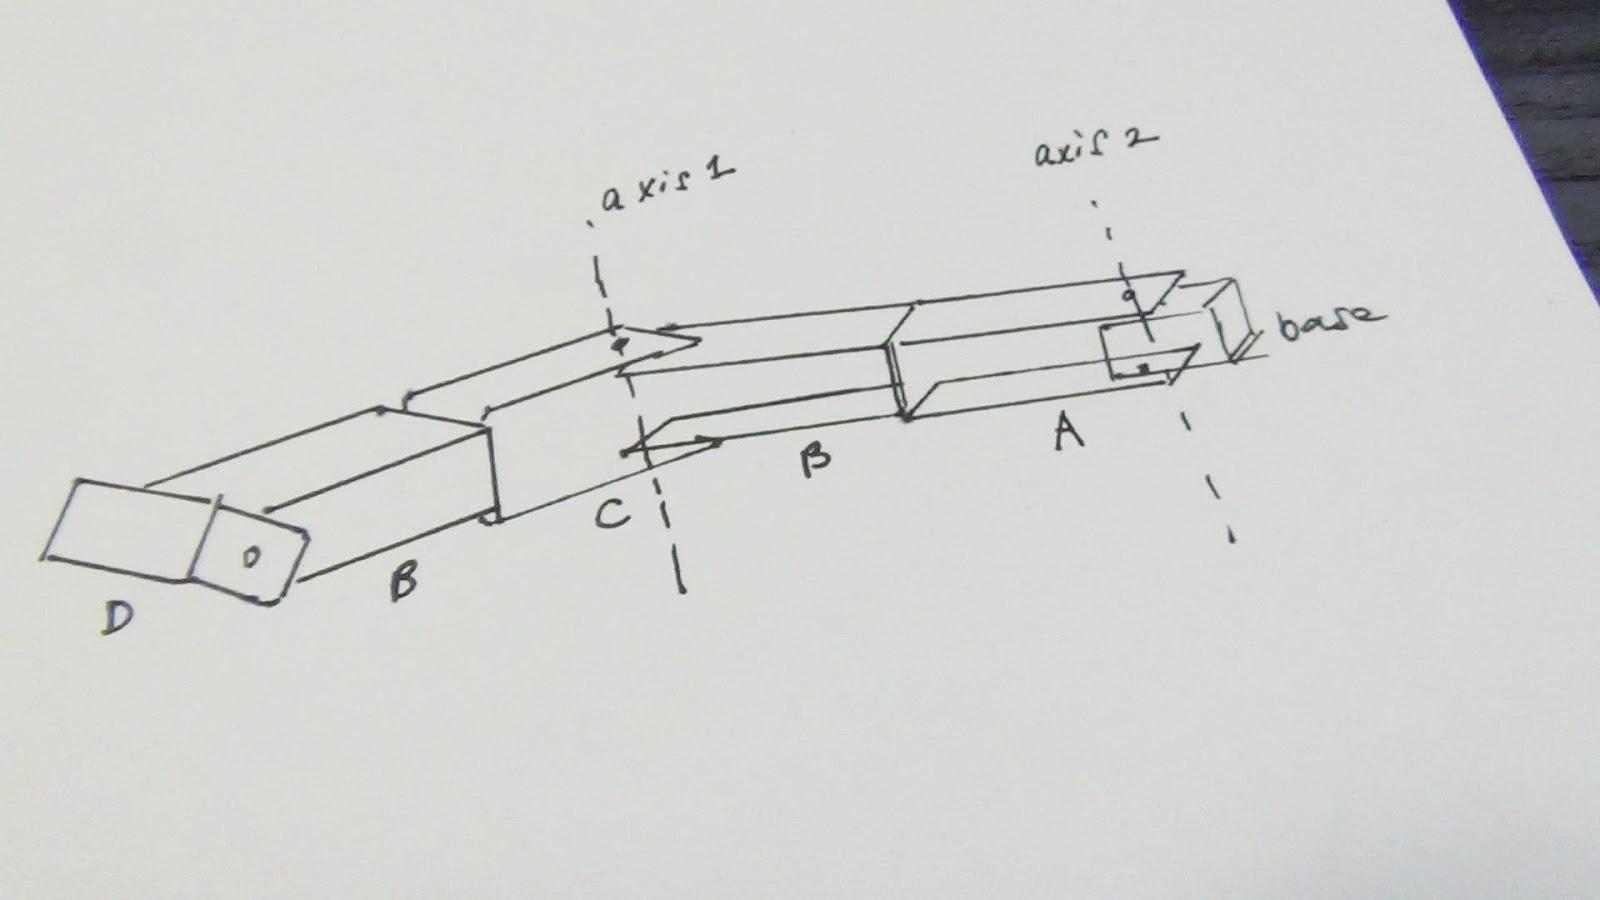 to be an artgrammer  robotic plotter arm